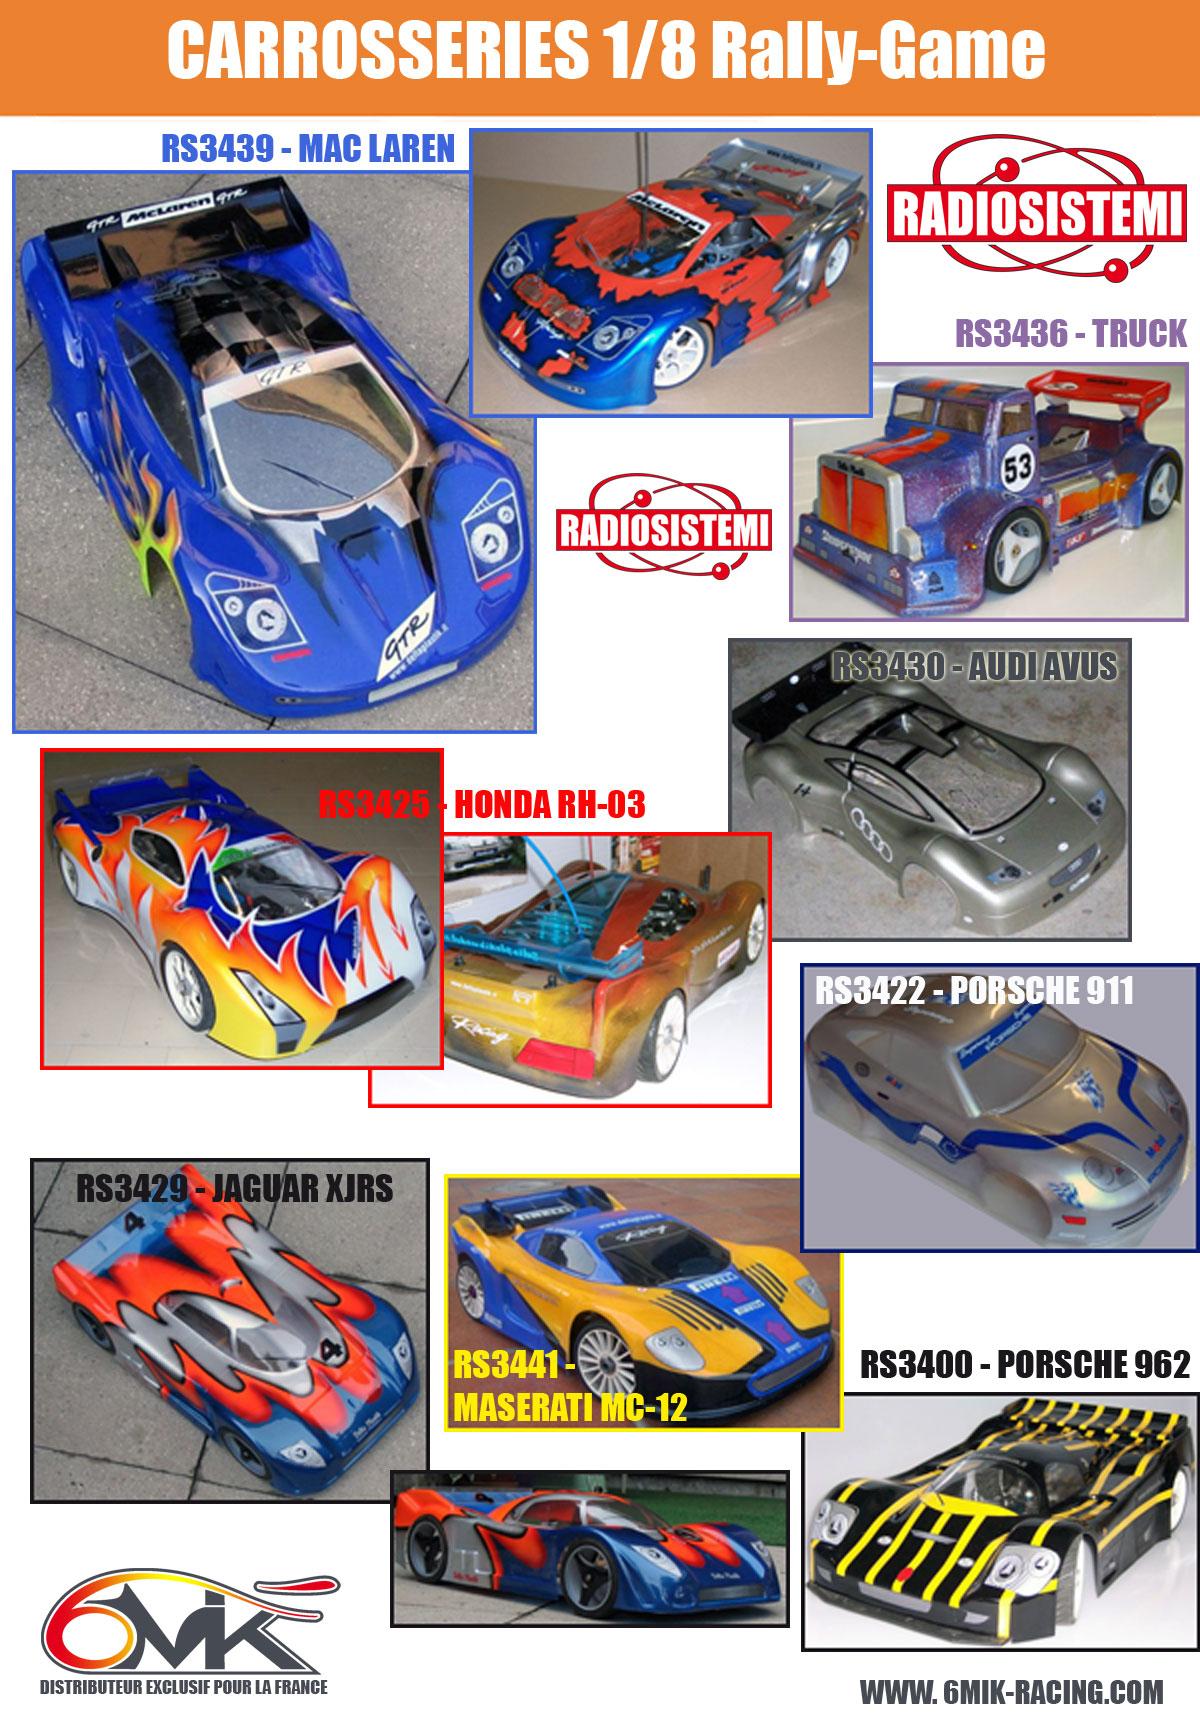 Carros-RG-1200